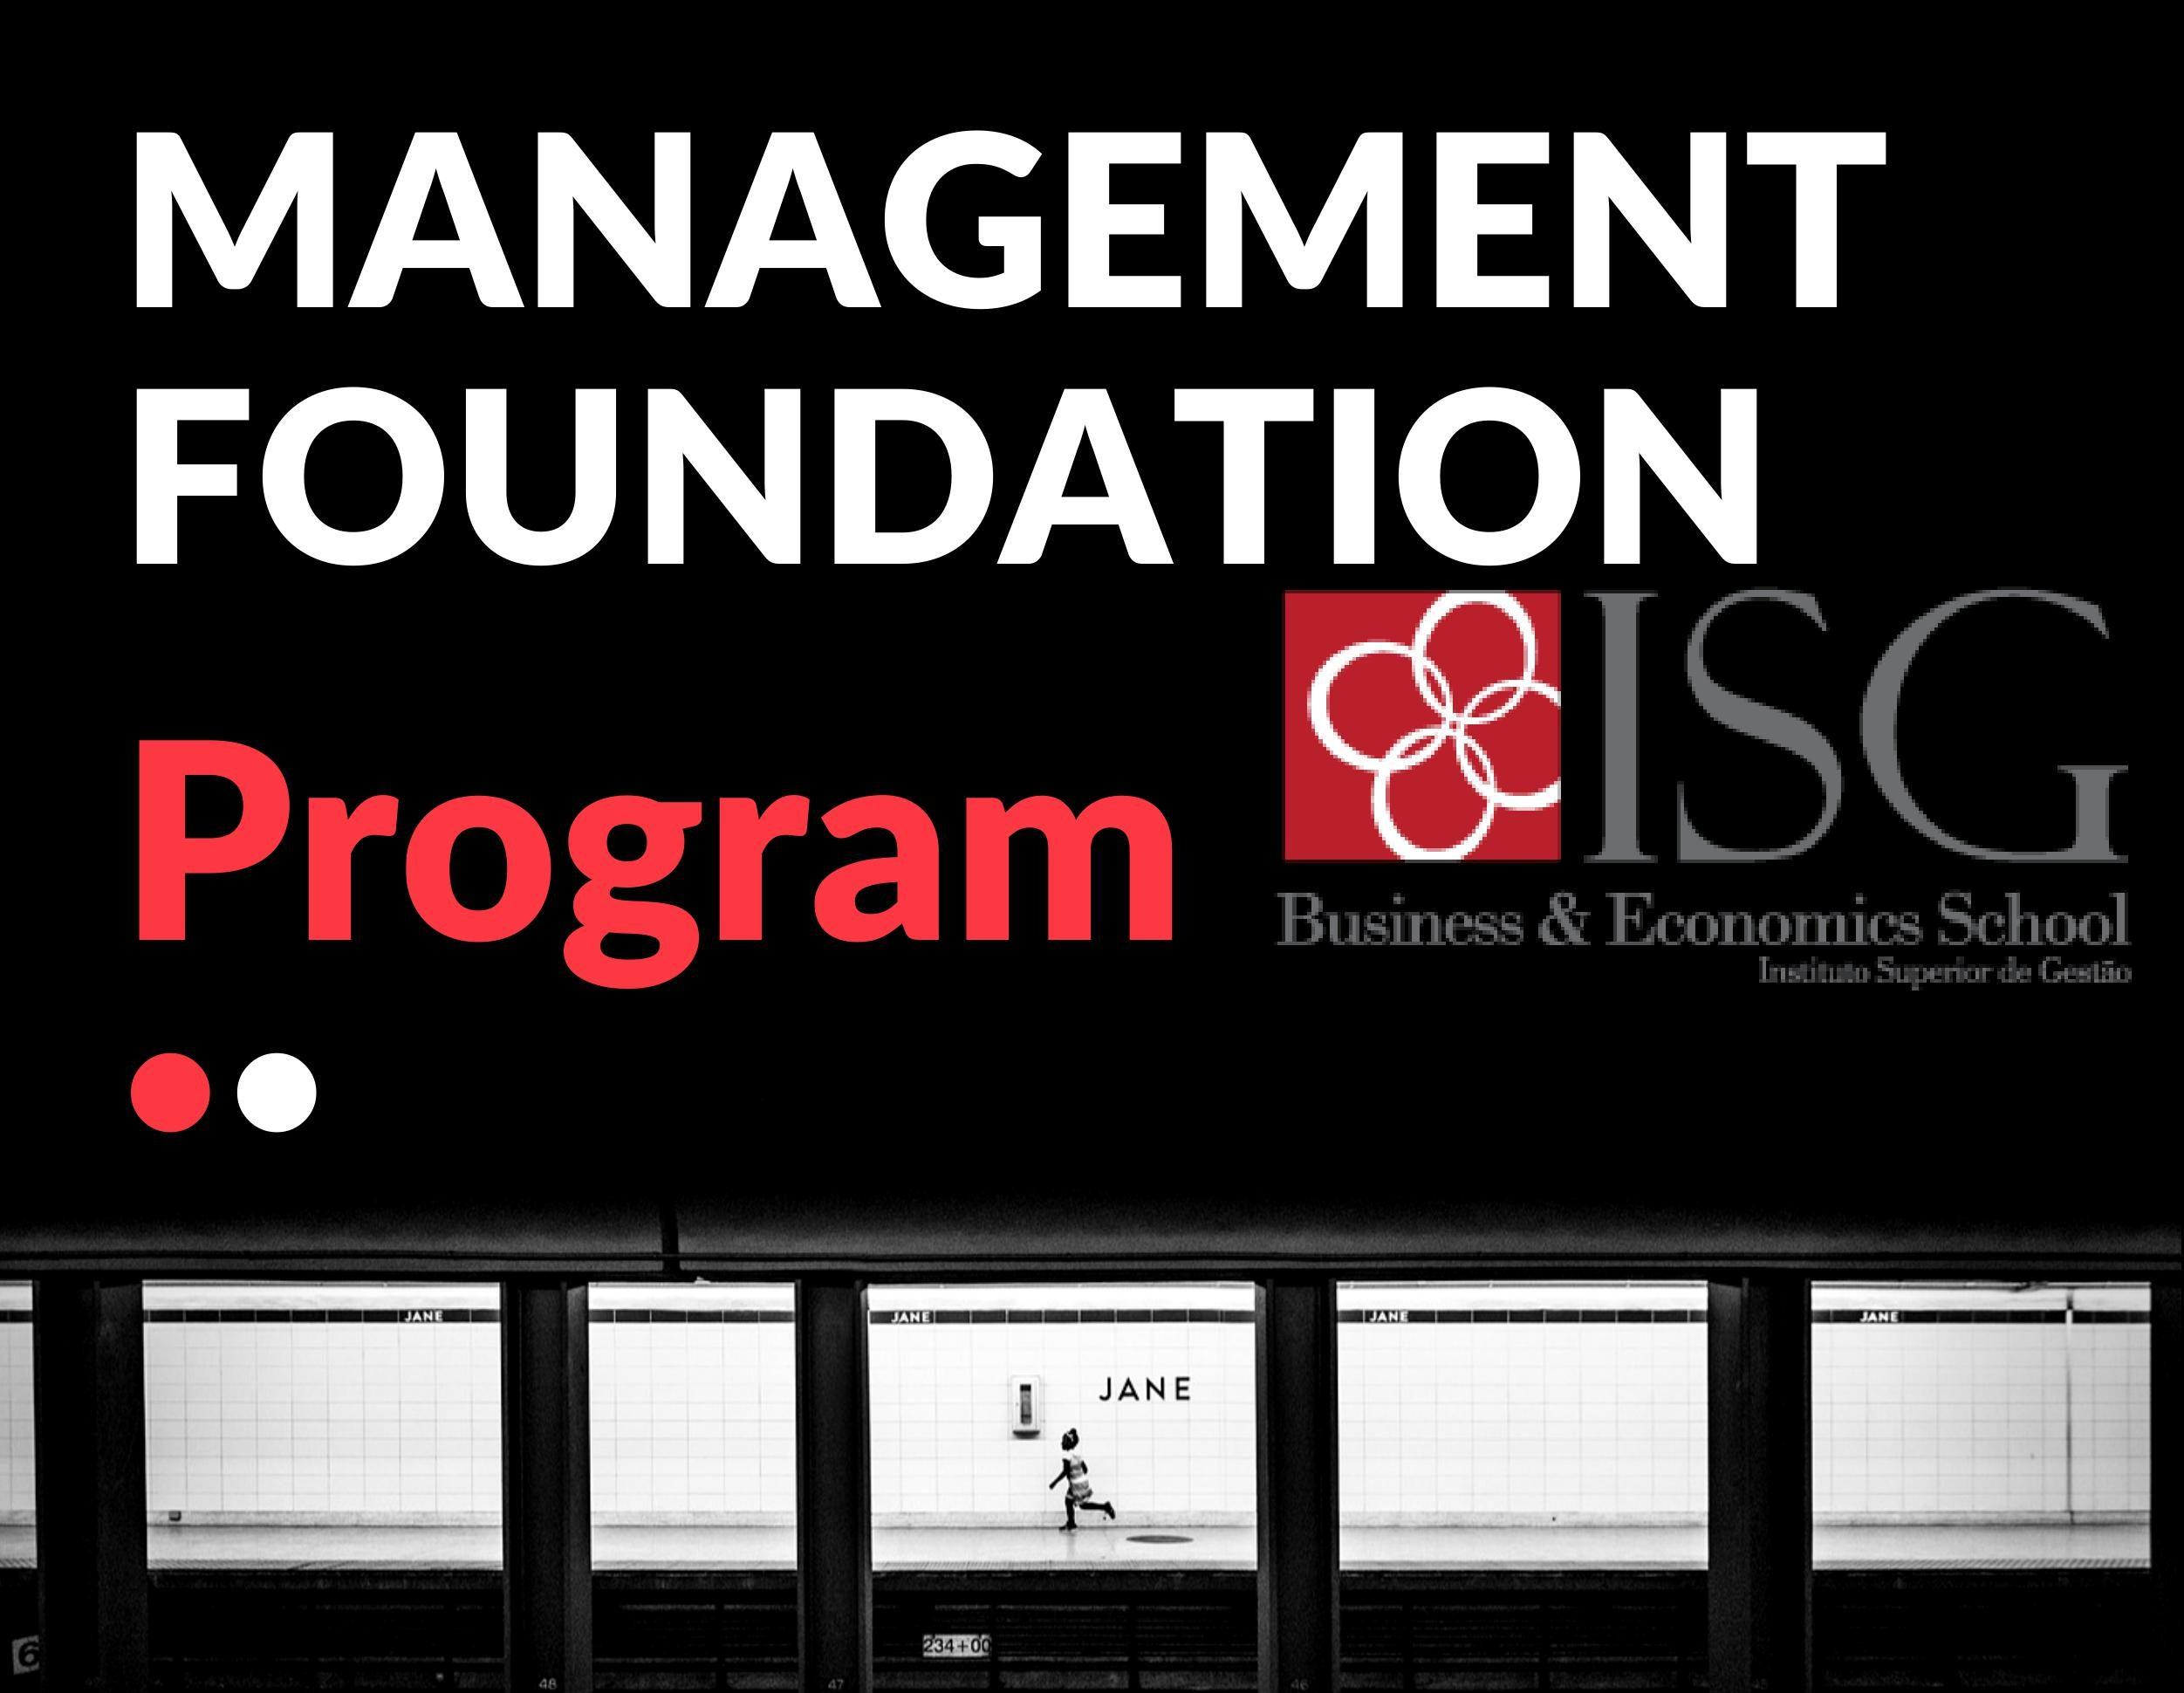 Management Foundation